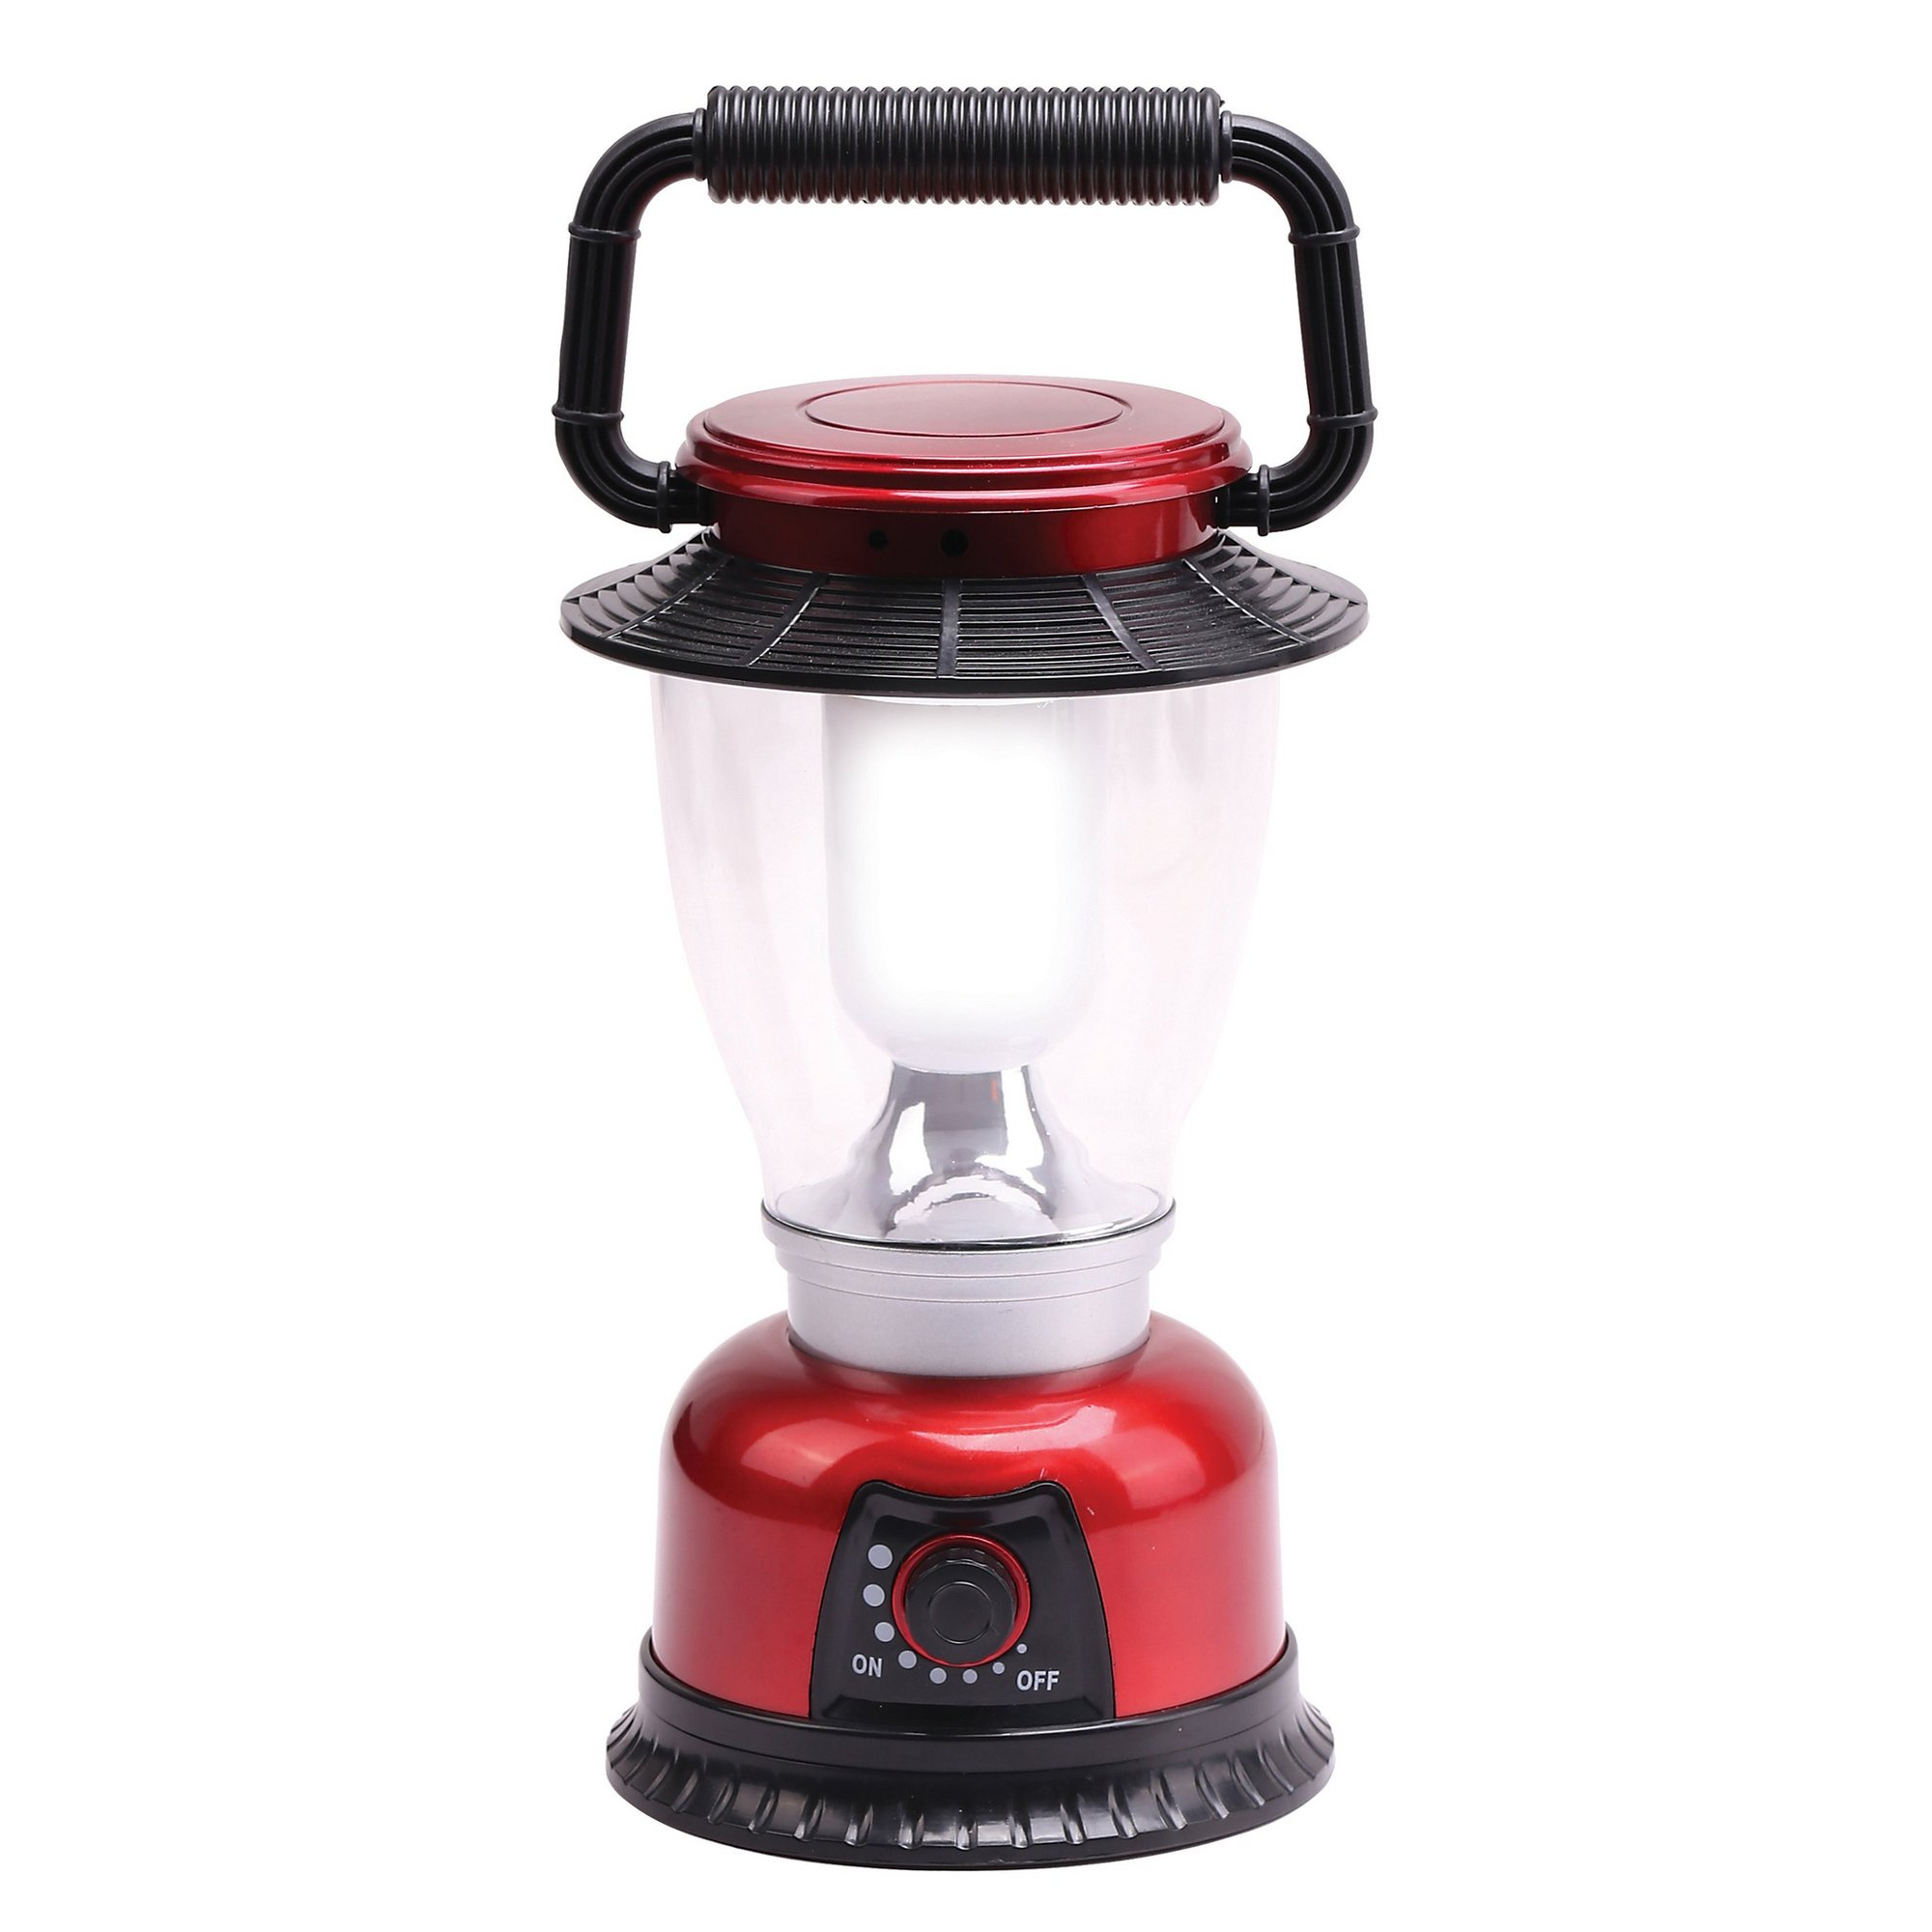 Image of Infapower 6 LED Large Outdoor Lantern